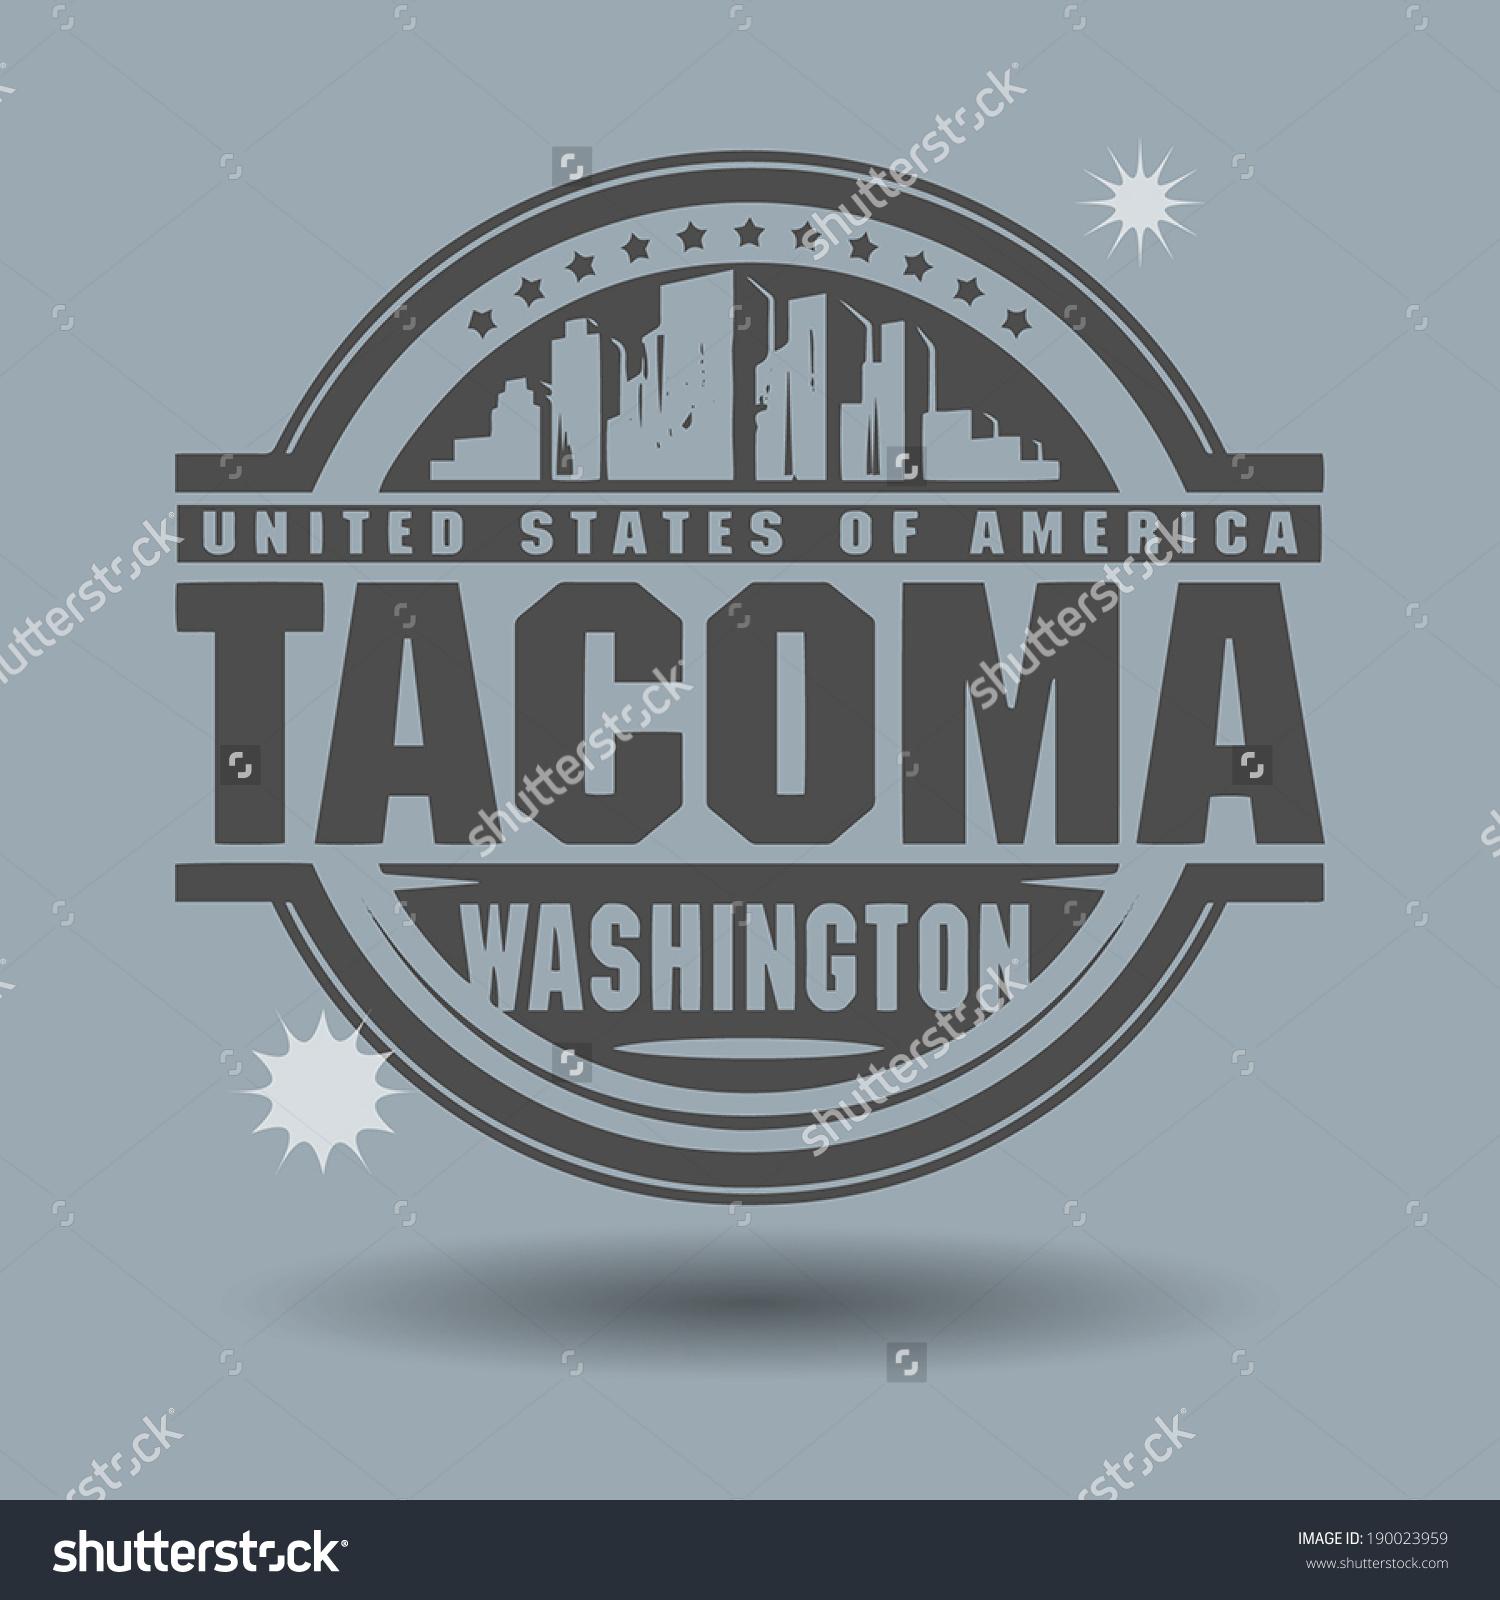 Tacoma Clipart